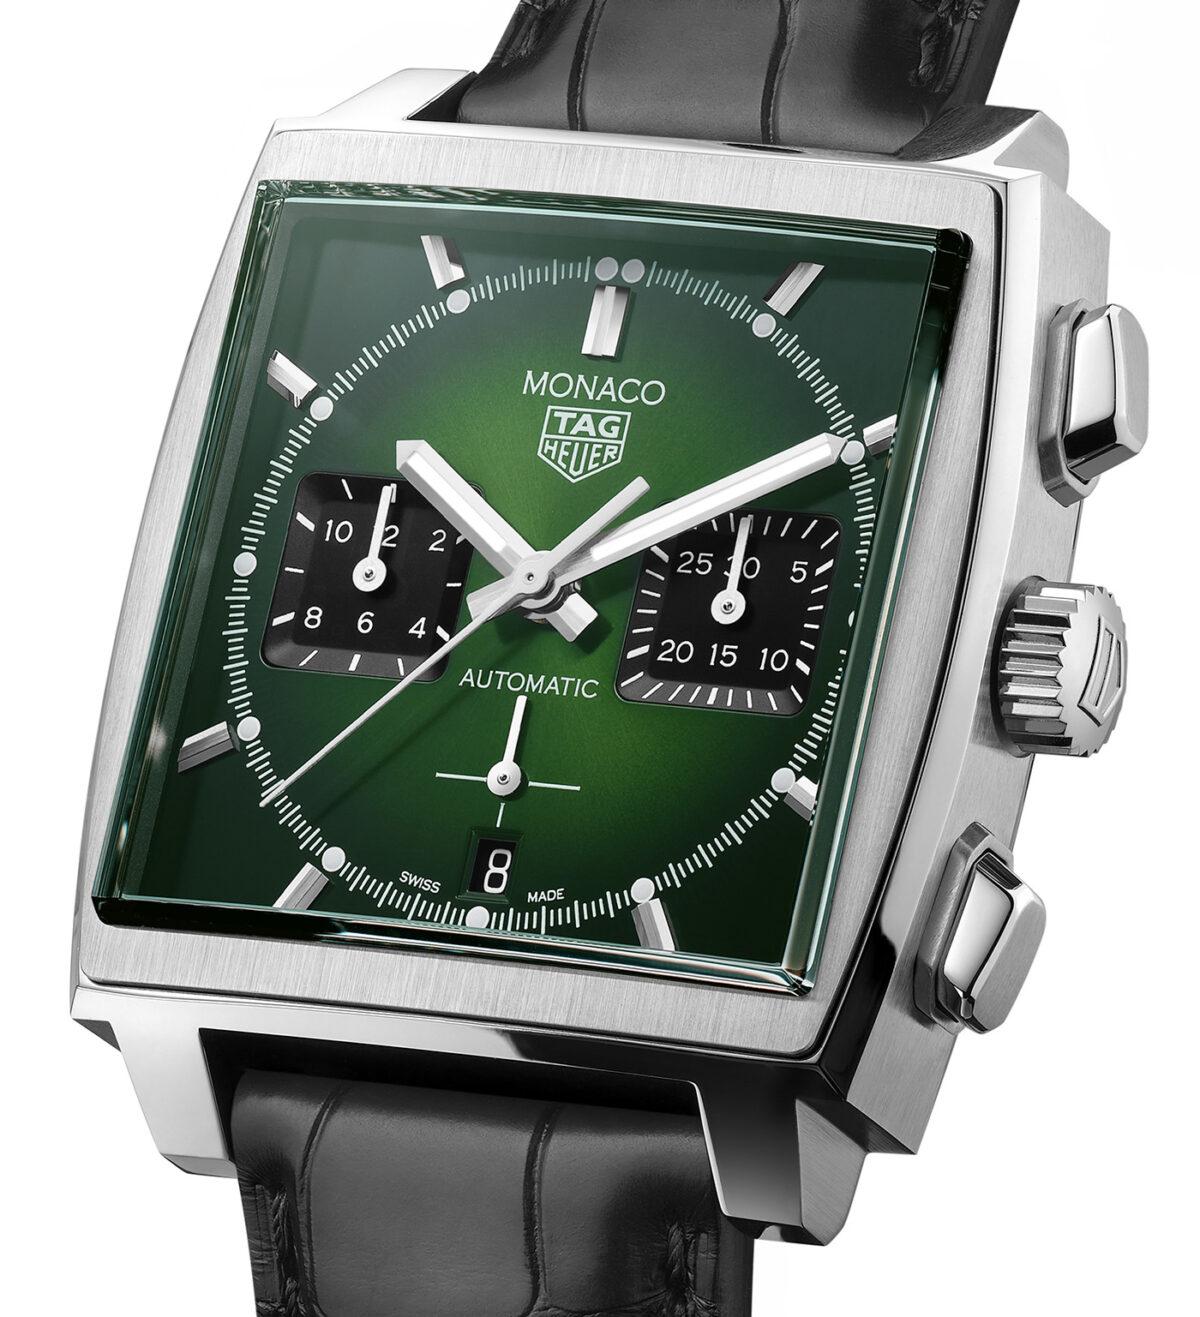 TAG Heuer Monaco Green Dial 3